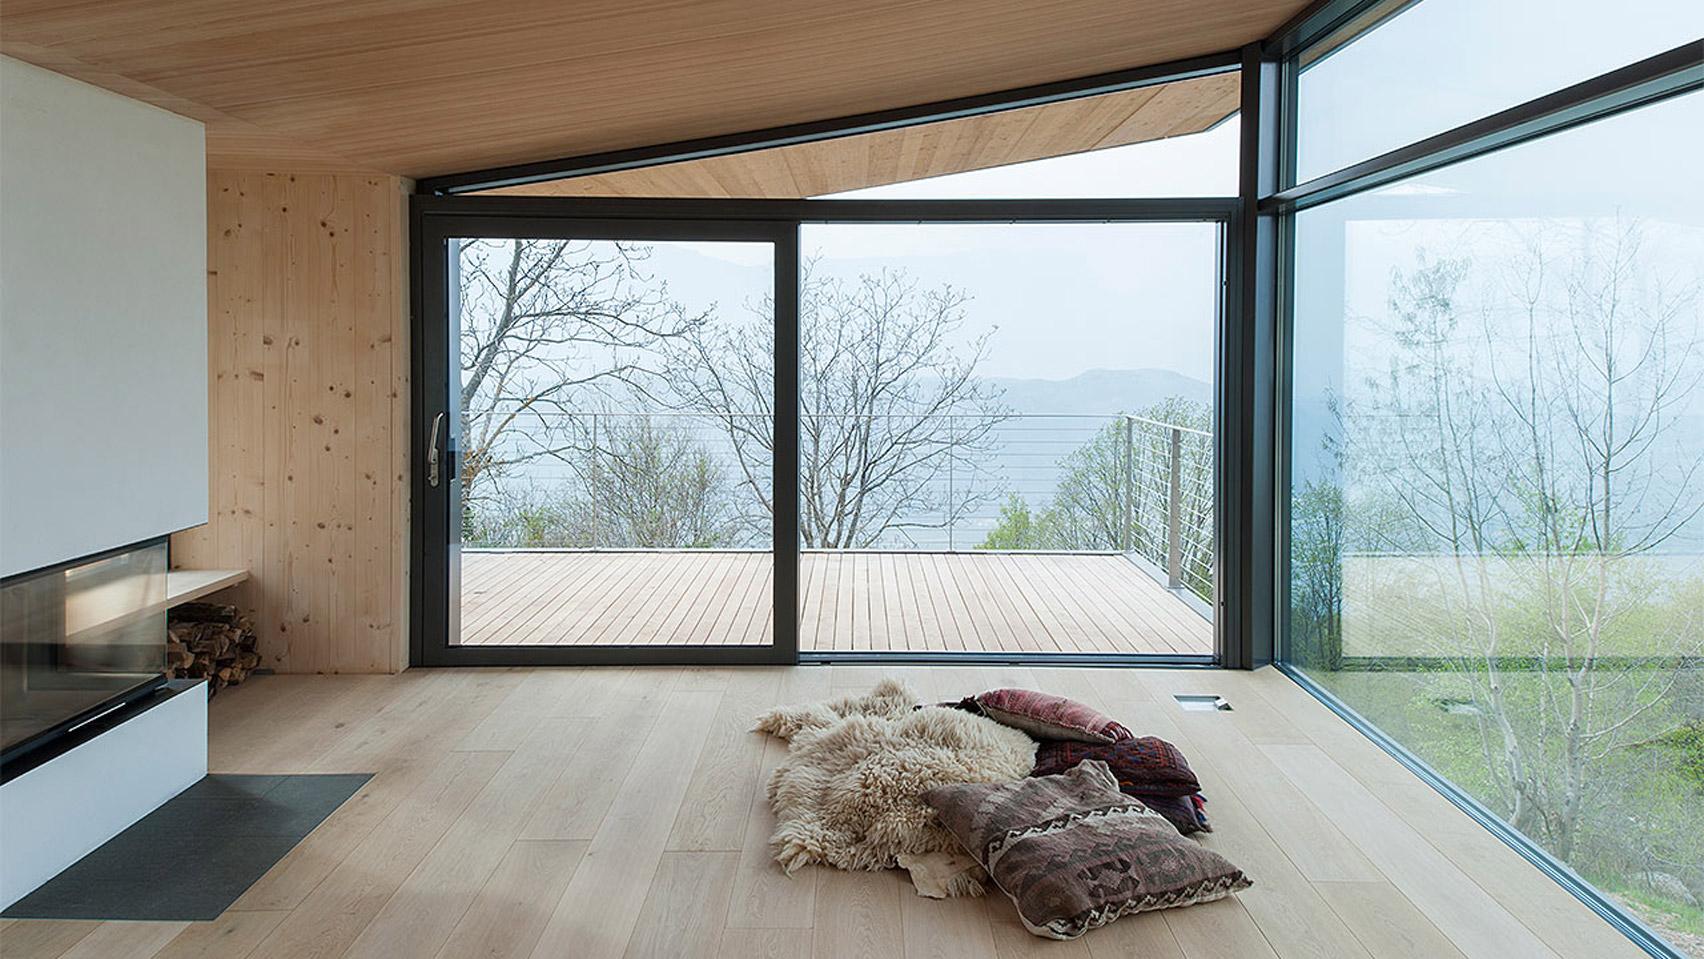 Glass walls frame vineyard views from Modostudio's mountain retreat